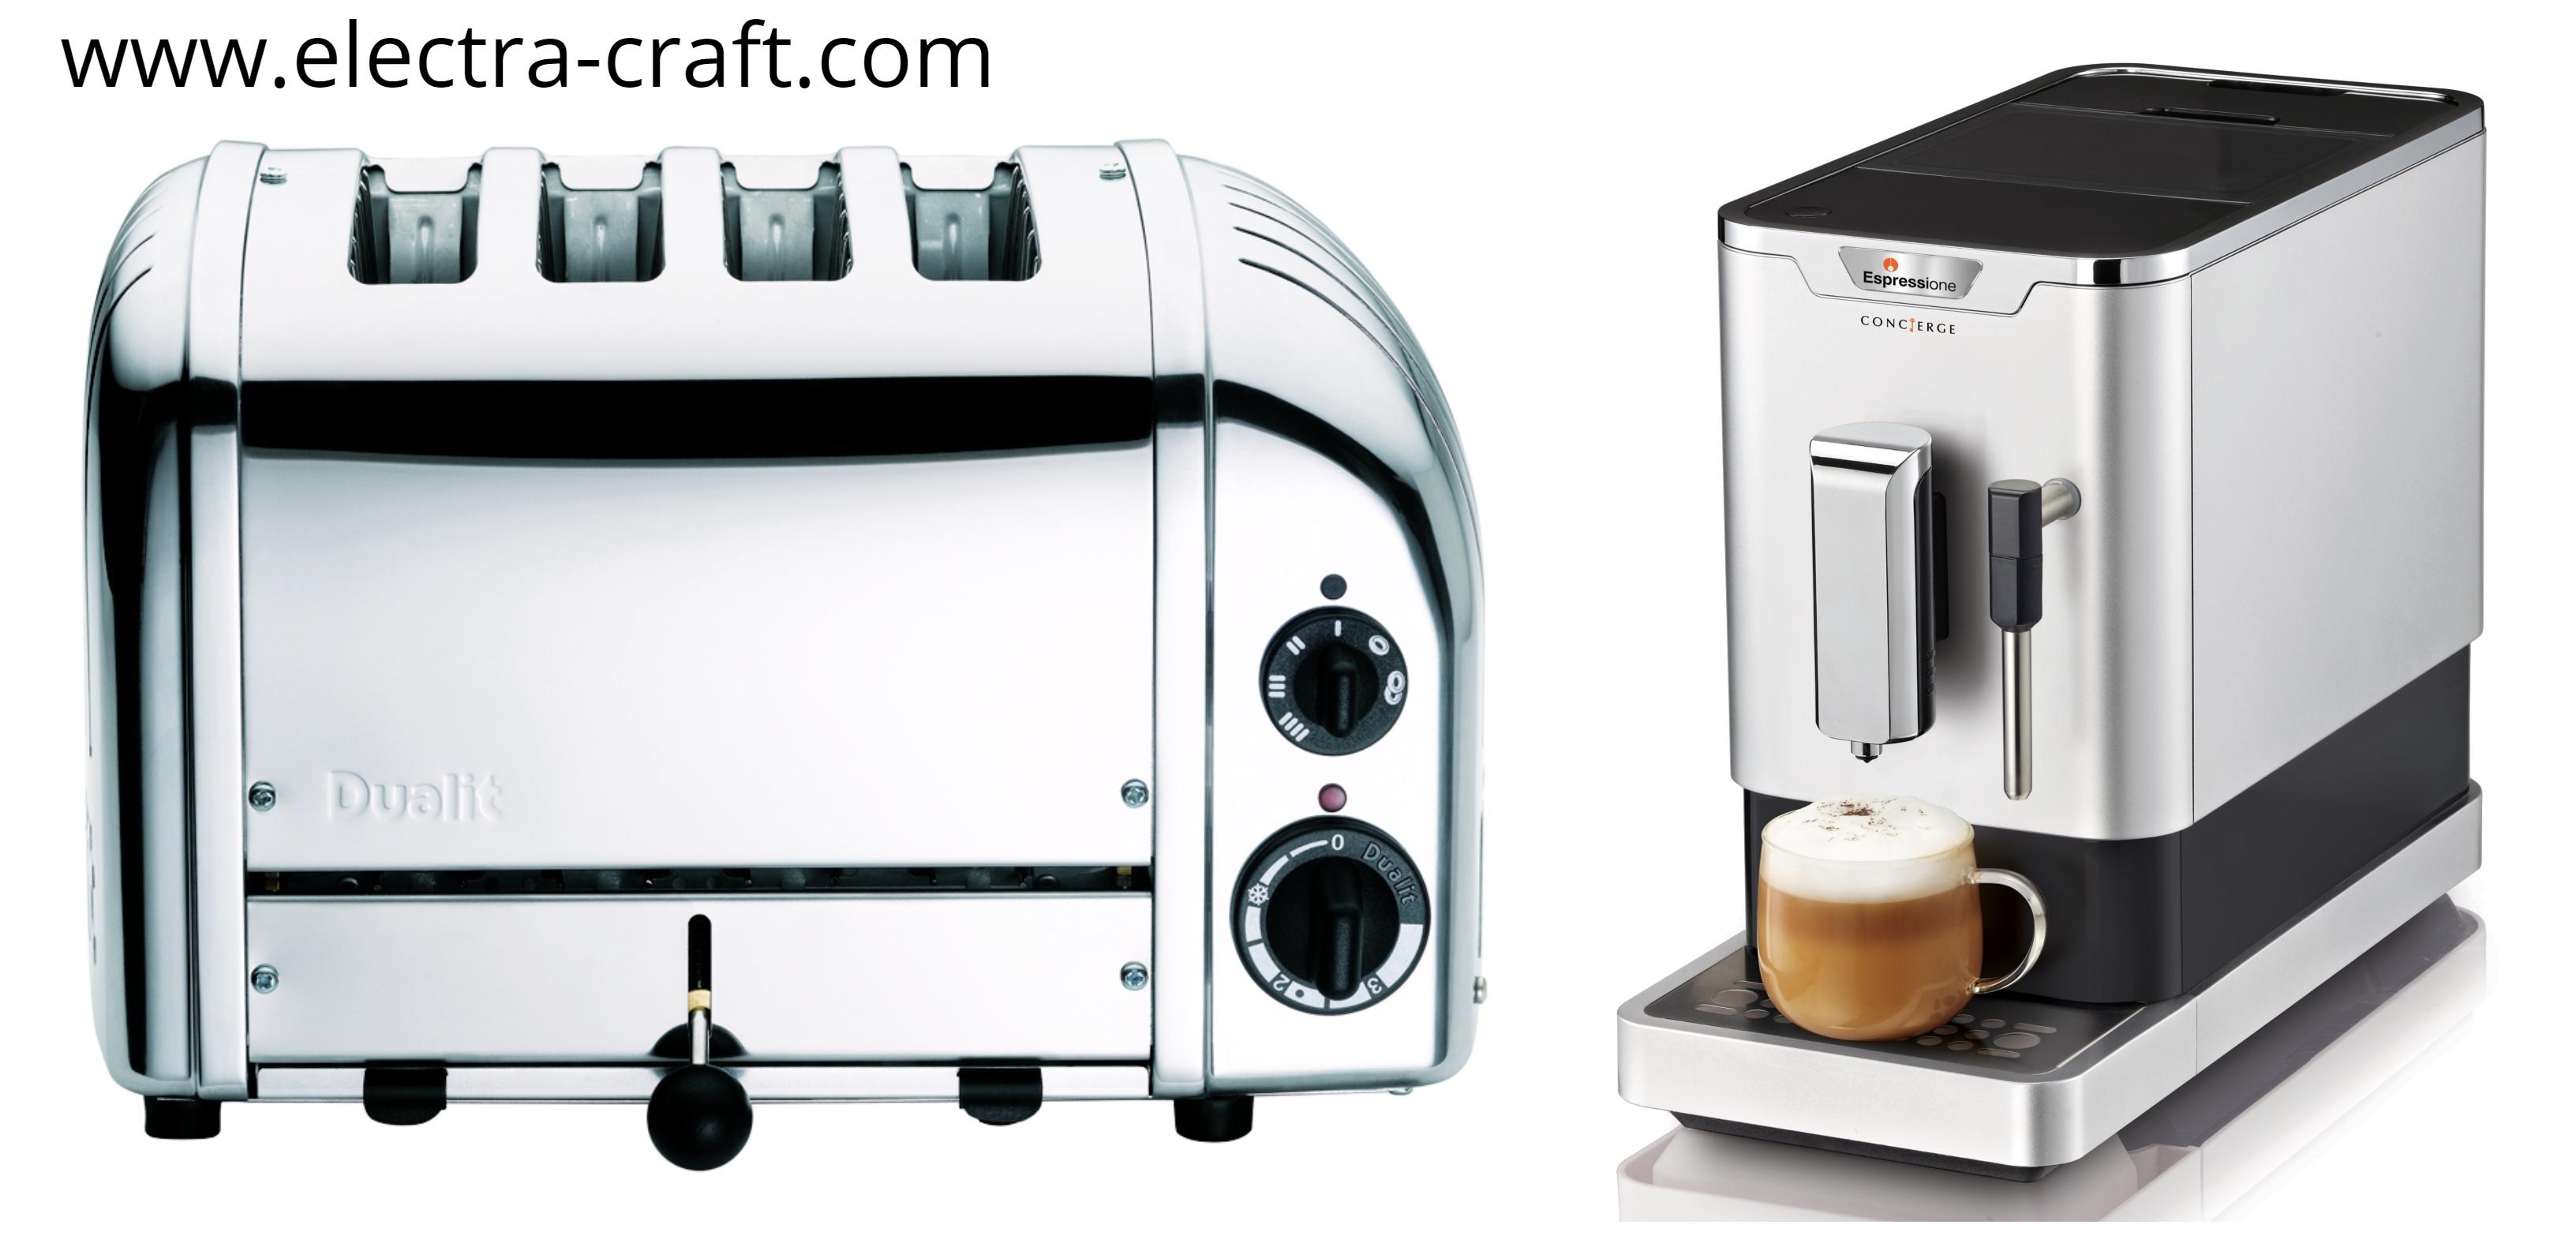 Dualit Toaster Parts Electra Craft Com